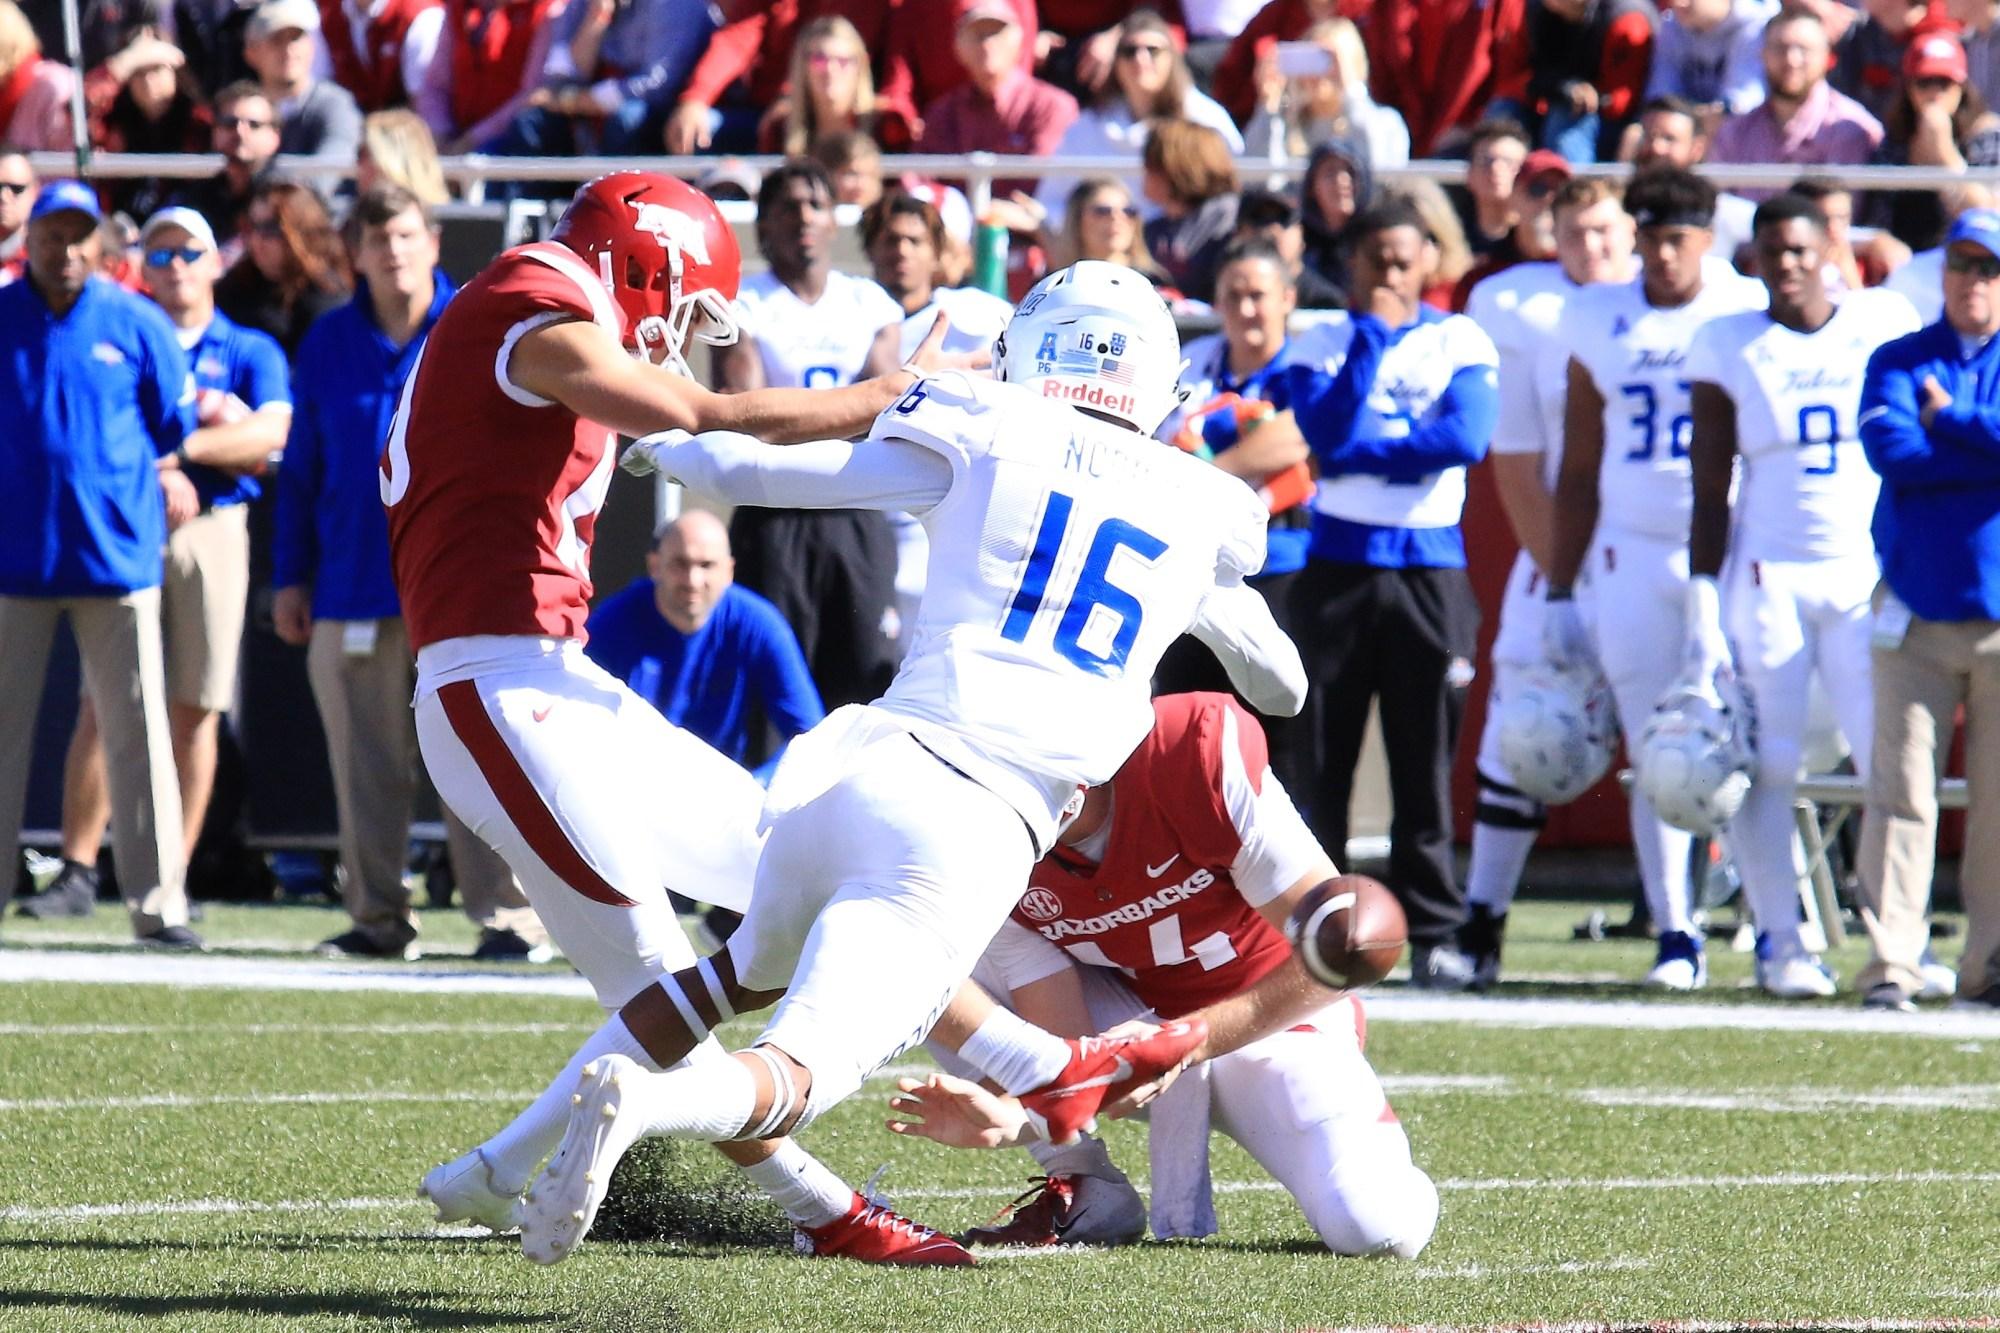 Connor Limpert FG vs Tulsa_1540502463341.JPG.jpg